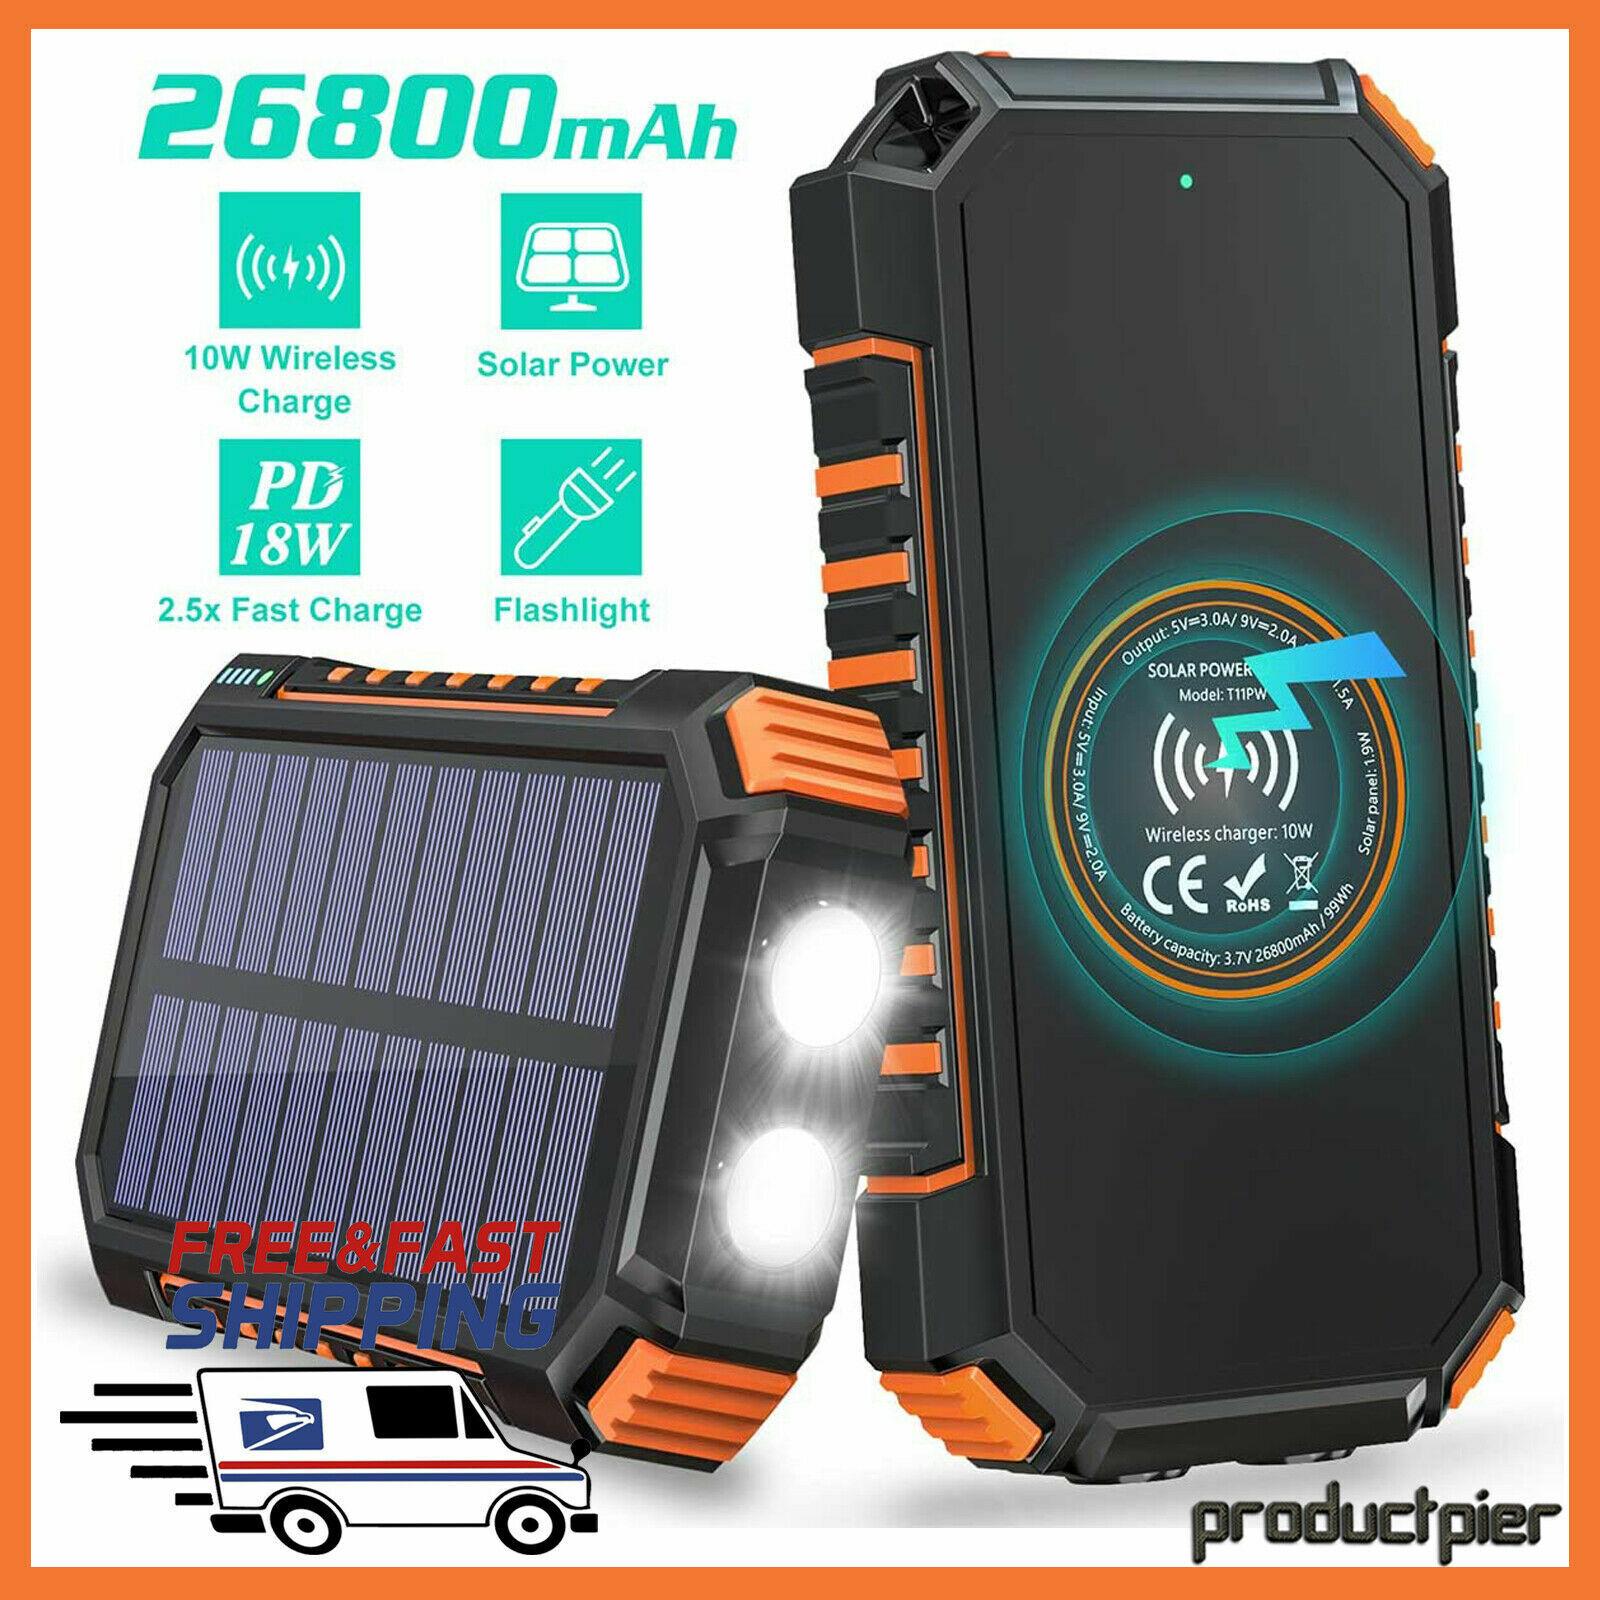 RAVPower Xtreme 26800mAh External Battery Charger Power Bank